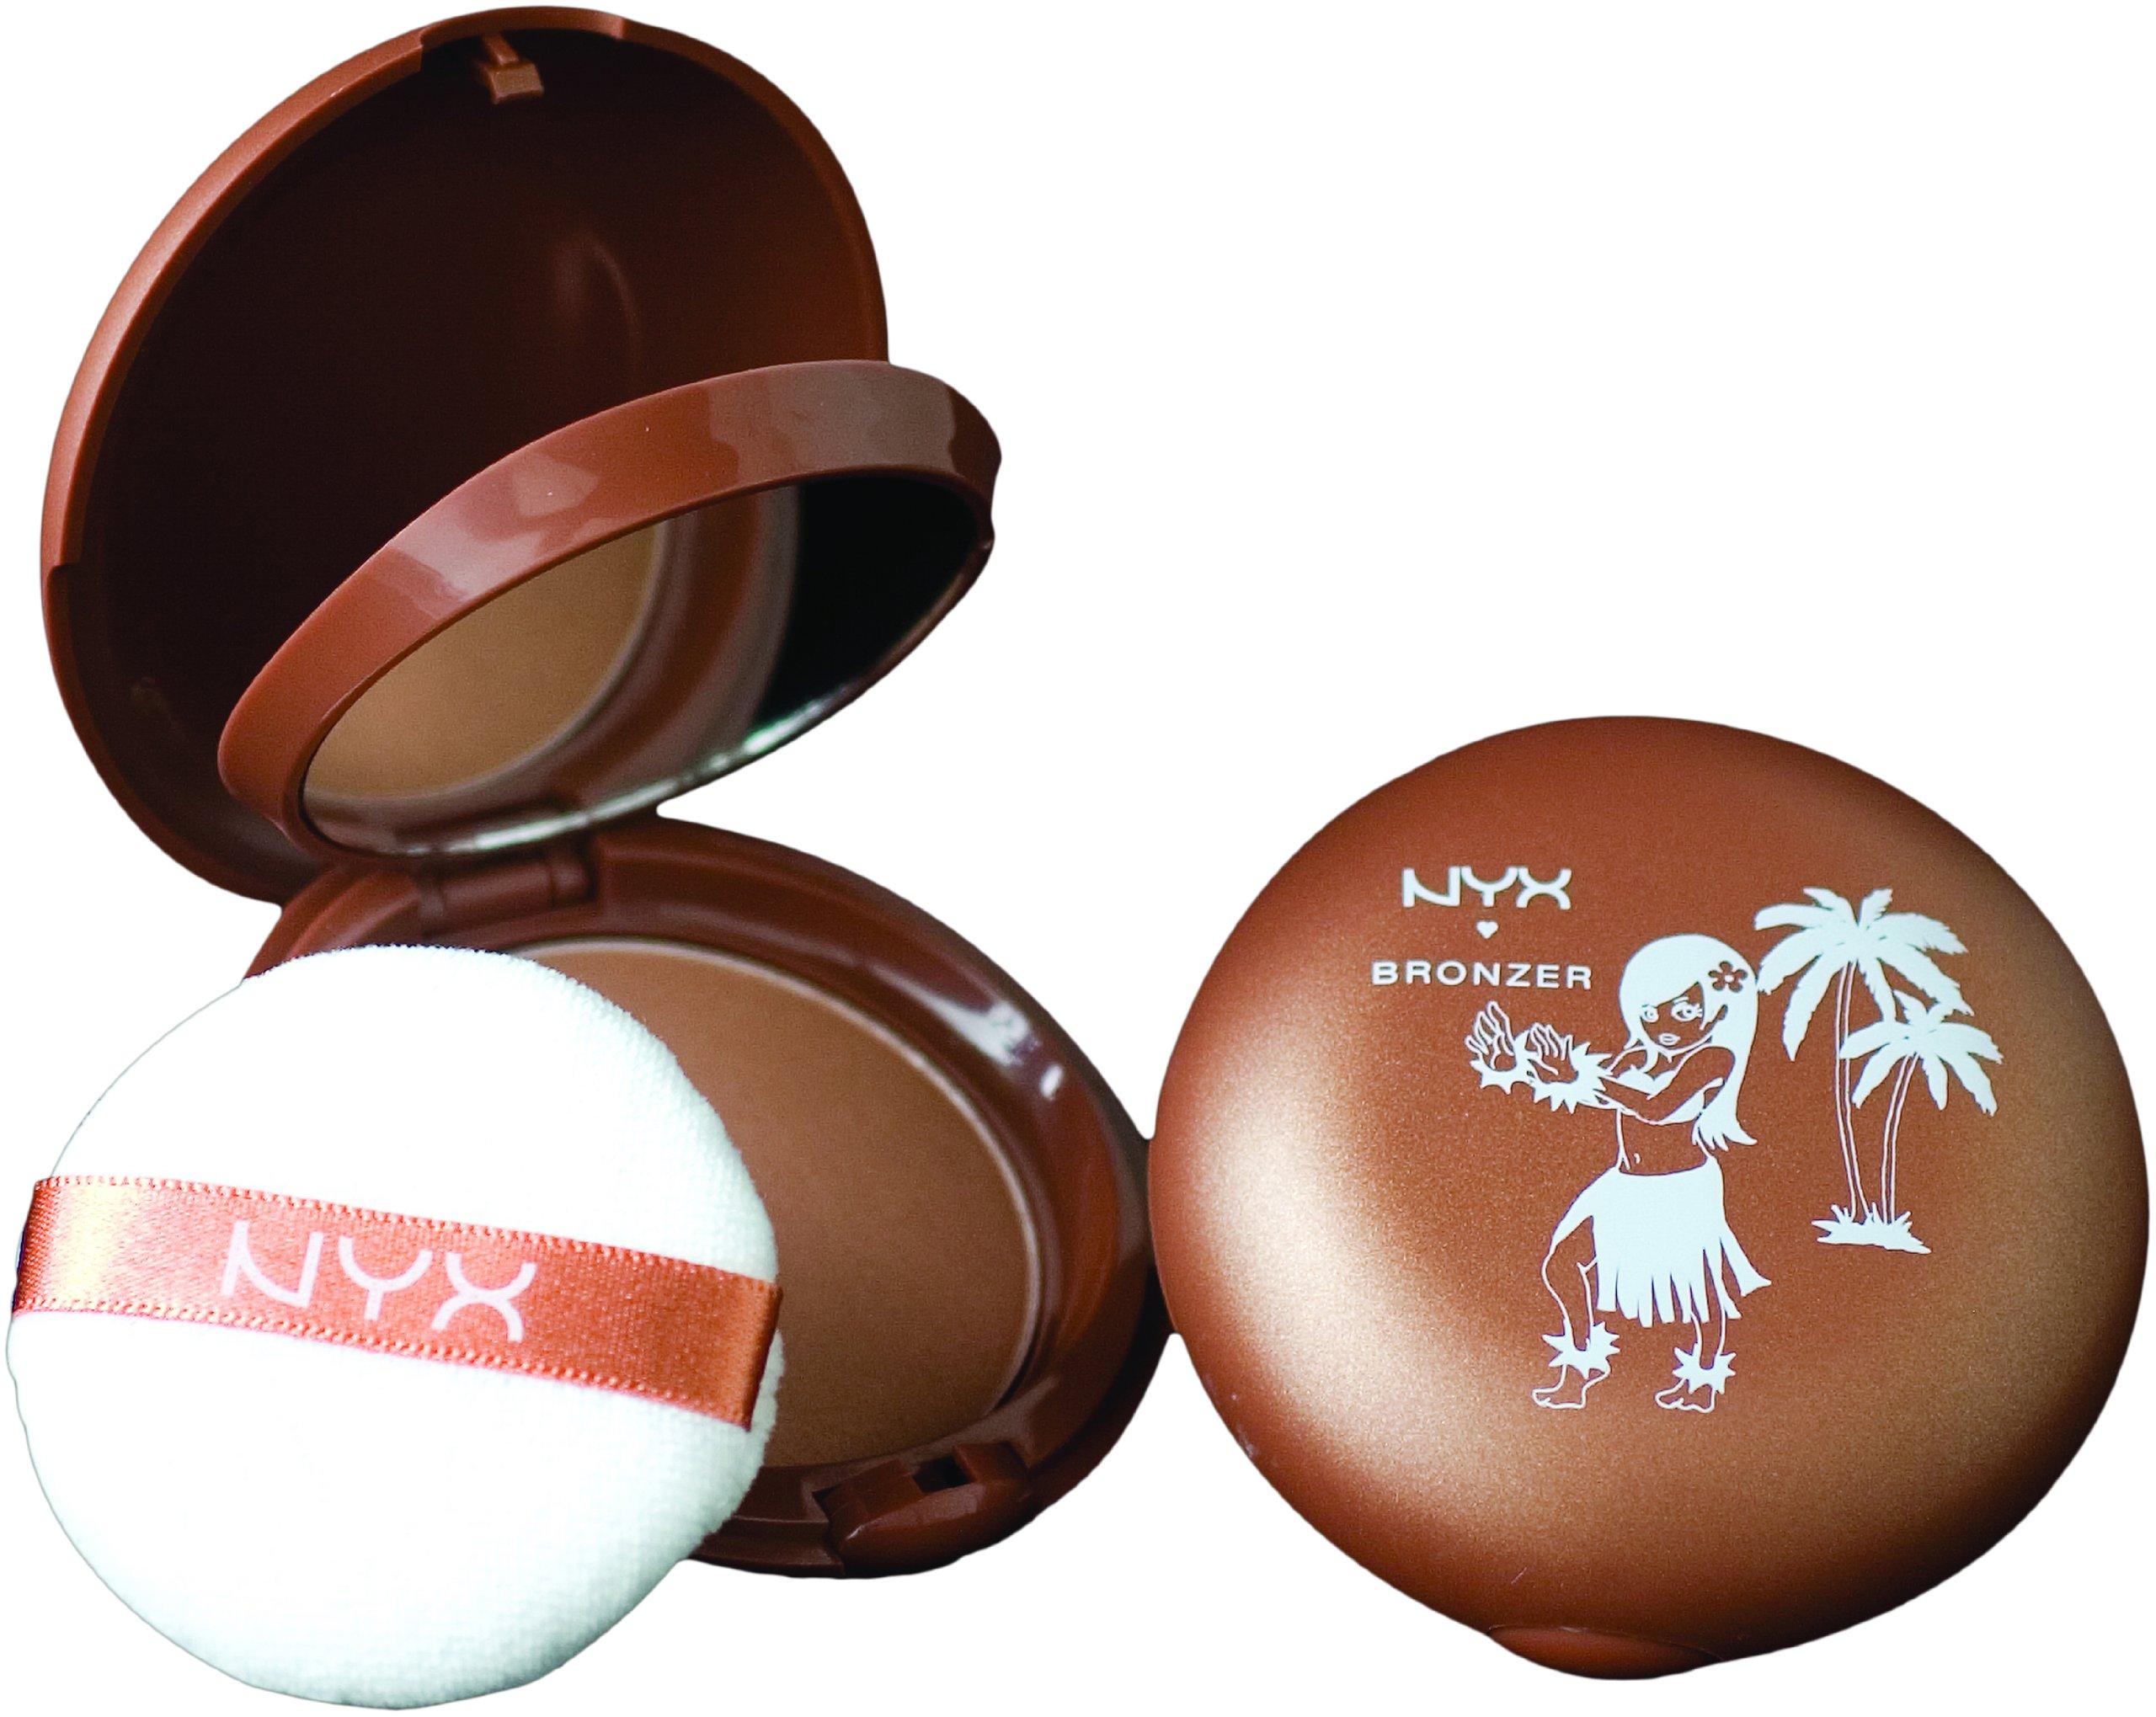 NYX Body Bronzer-NXBB04 Daydream of Lanai by NYX